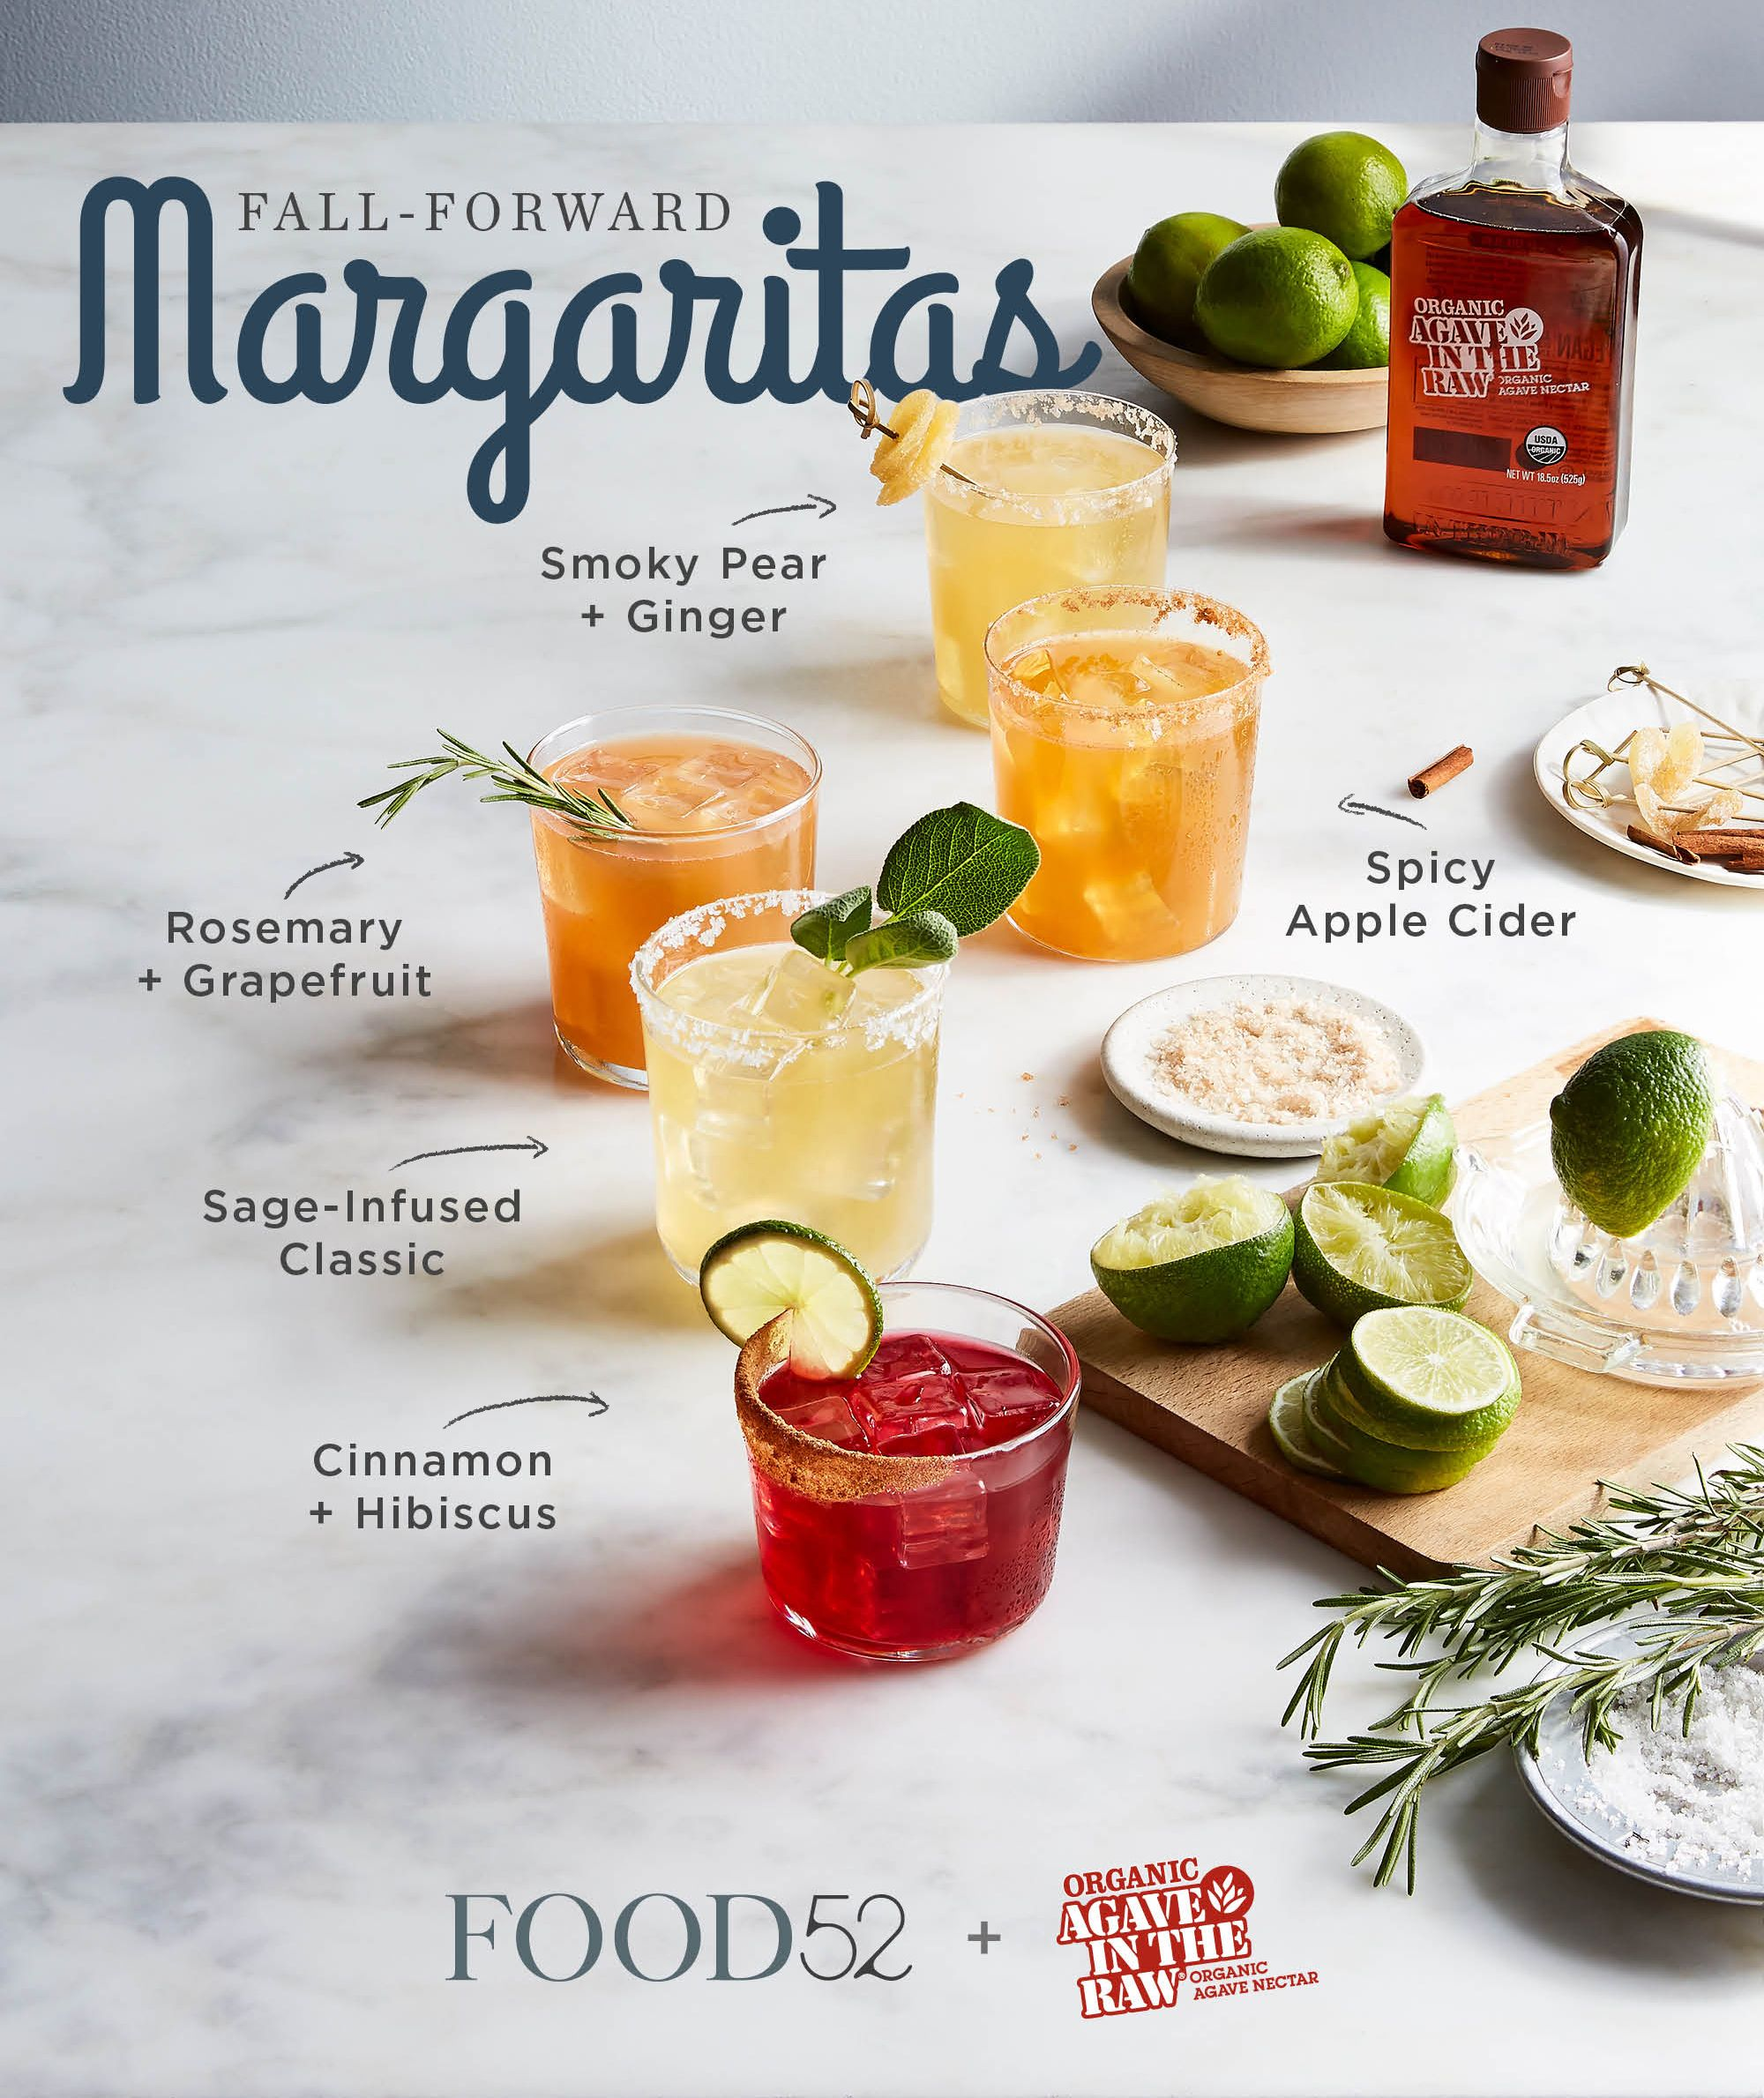 5 Margarita Recipes Perfect For Fall